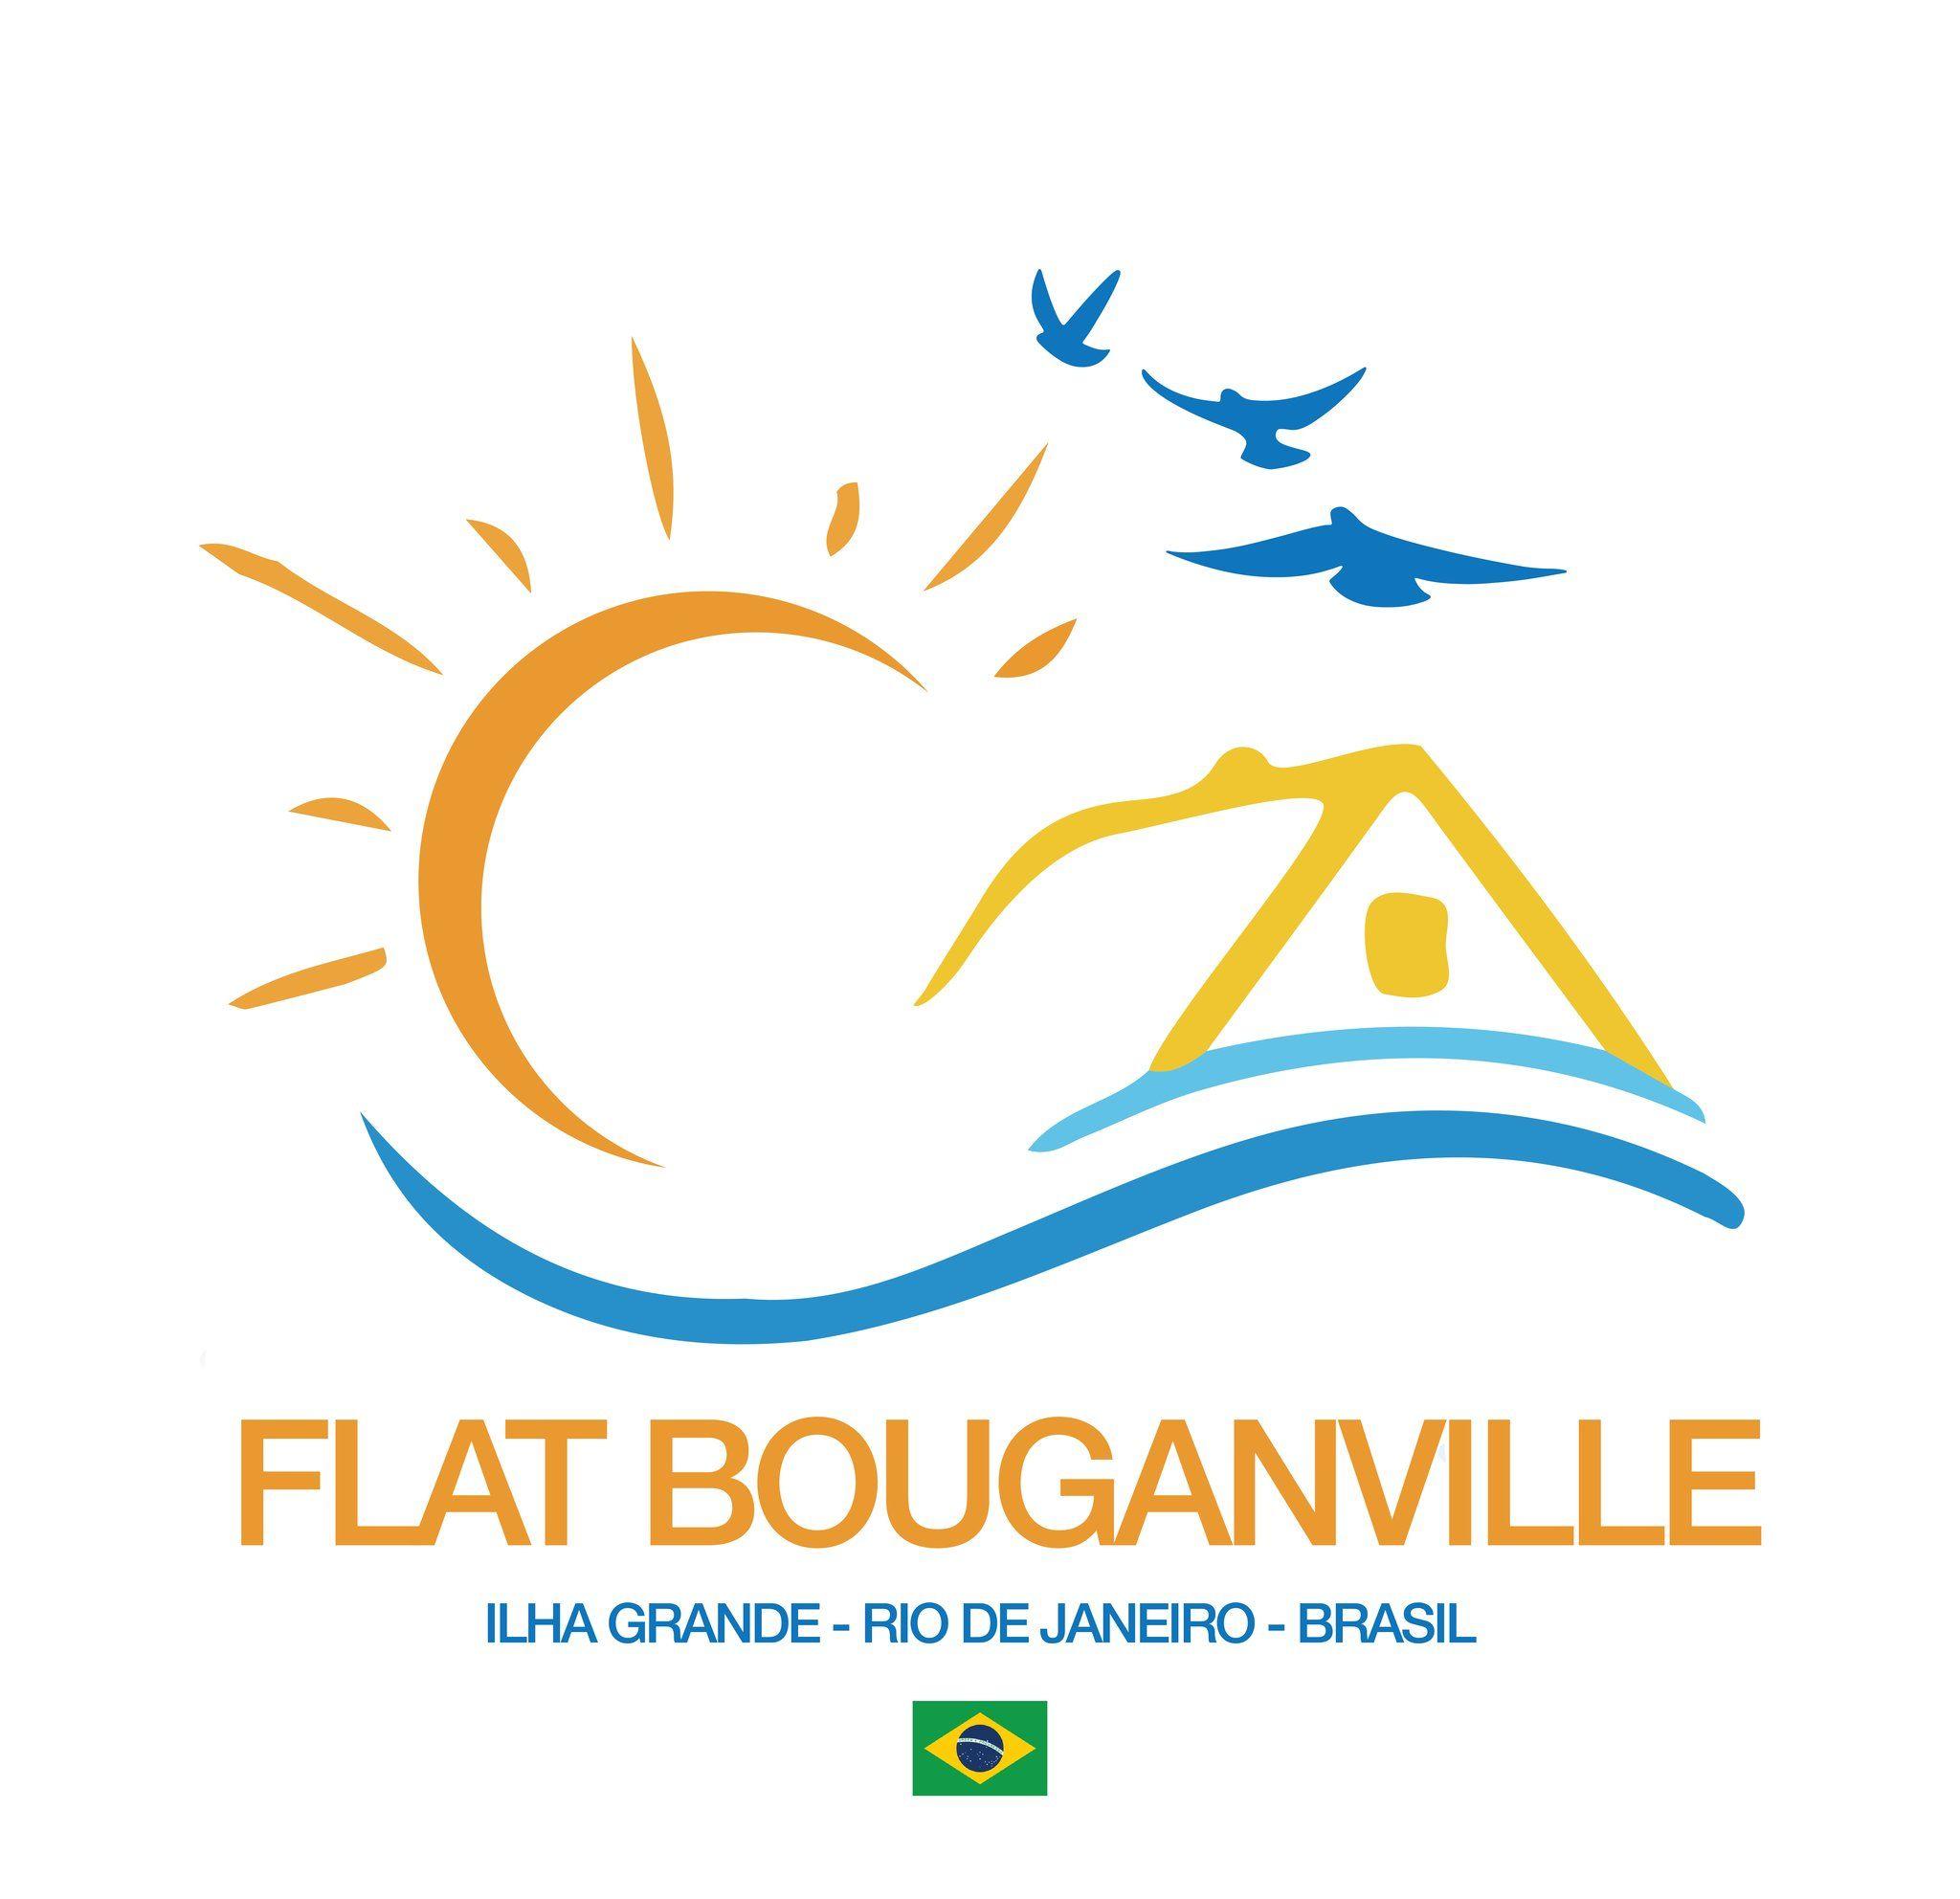 Flat Bouganville